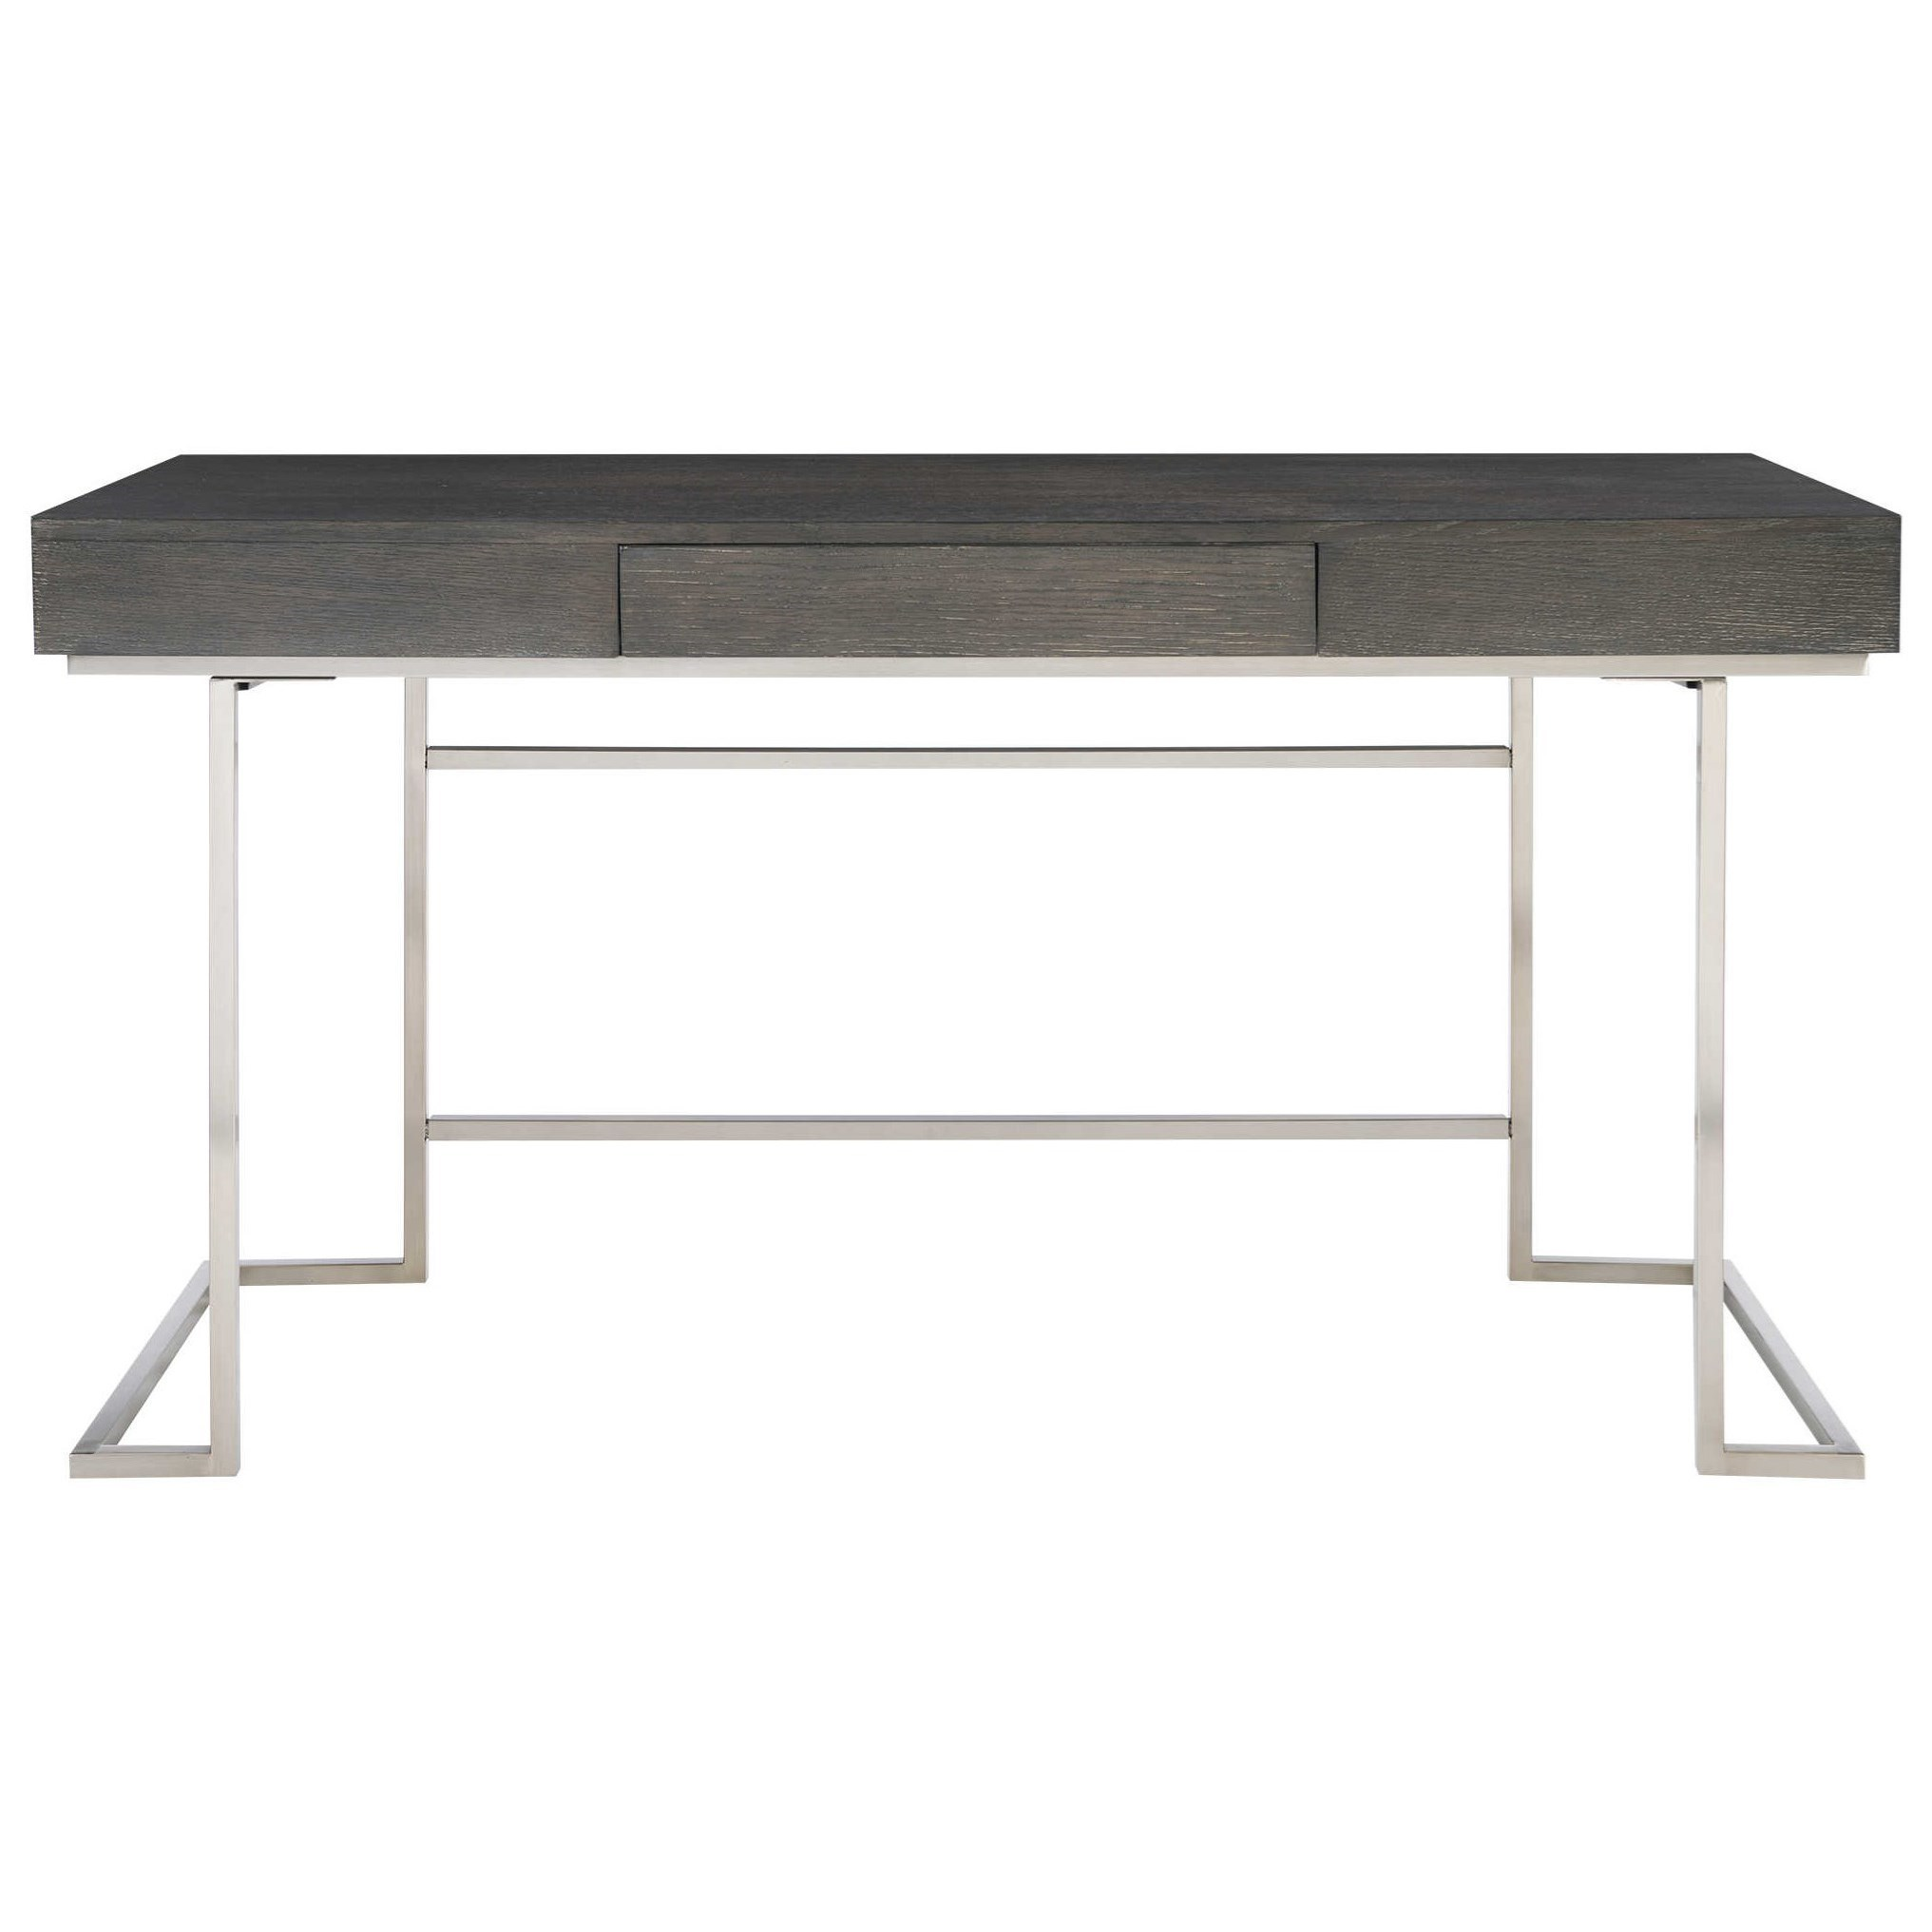 Accent Furniture Claude Modern Oak Desk by Uttermost at Goffena Furniture & Mattress Center